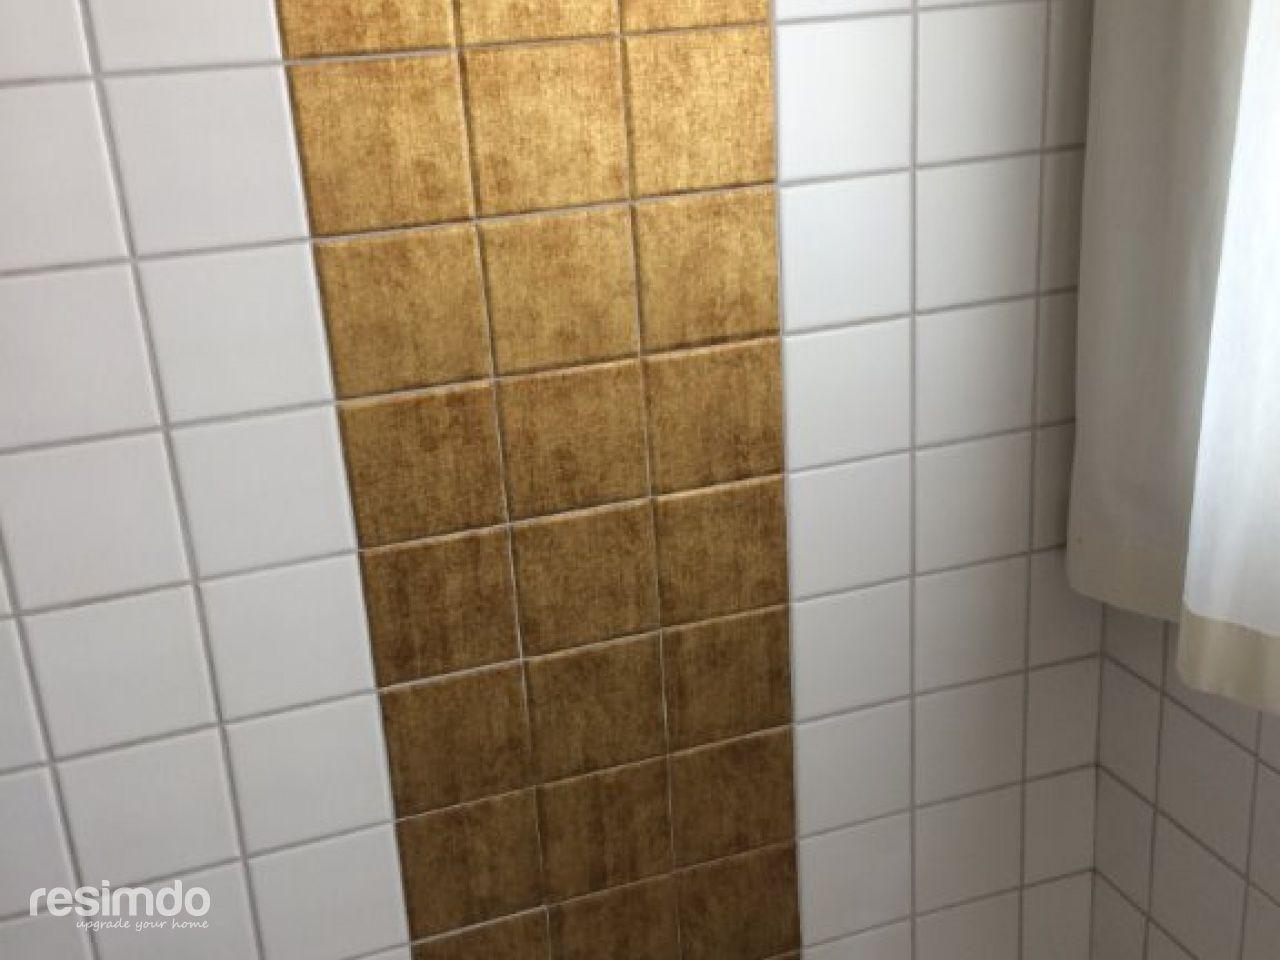 Kann Man Badezimmer Fliesen Uberkleben Room Room Divider Home